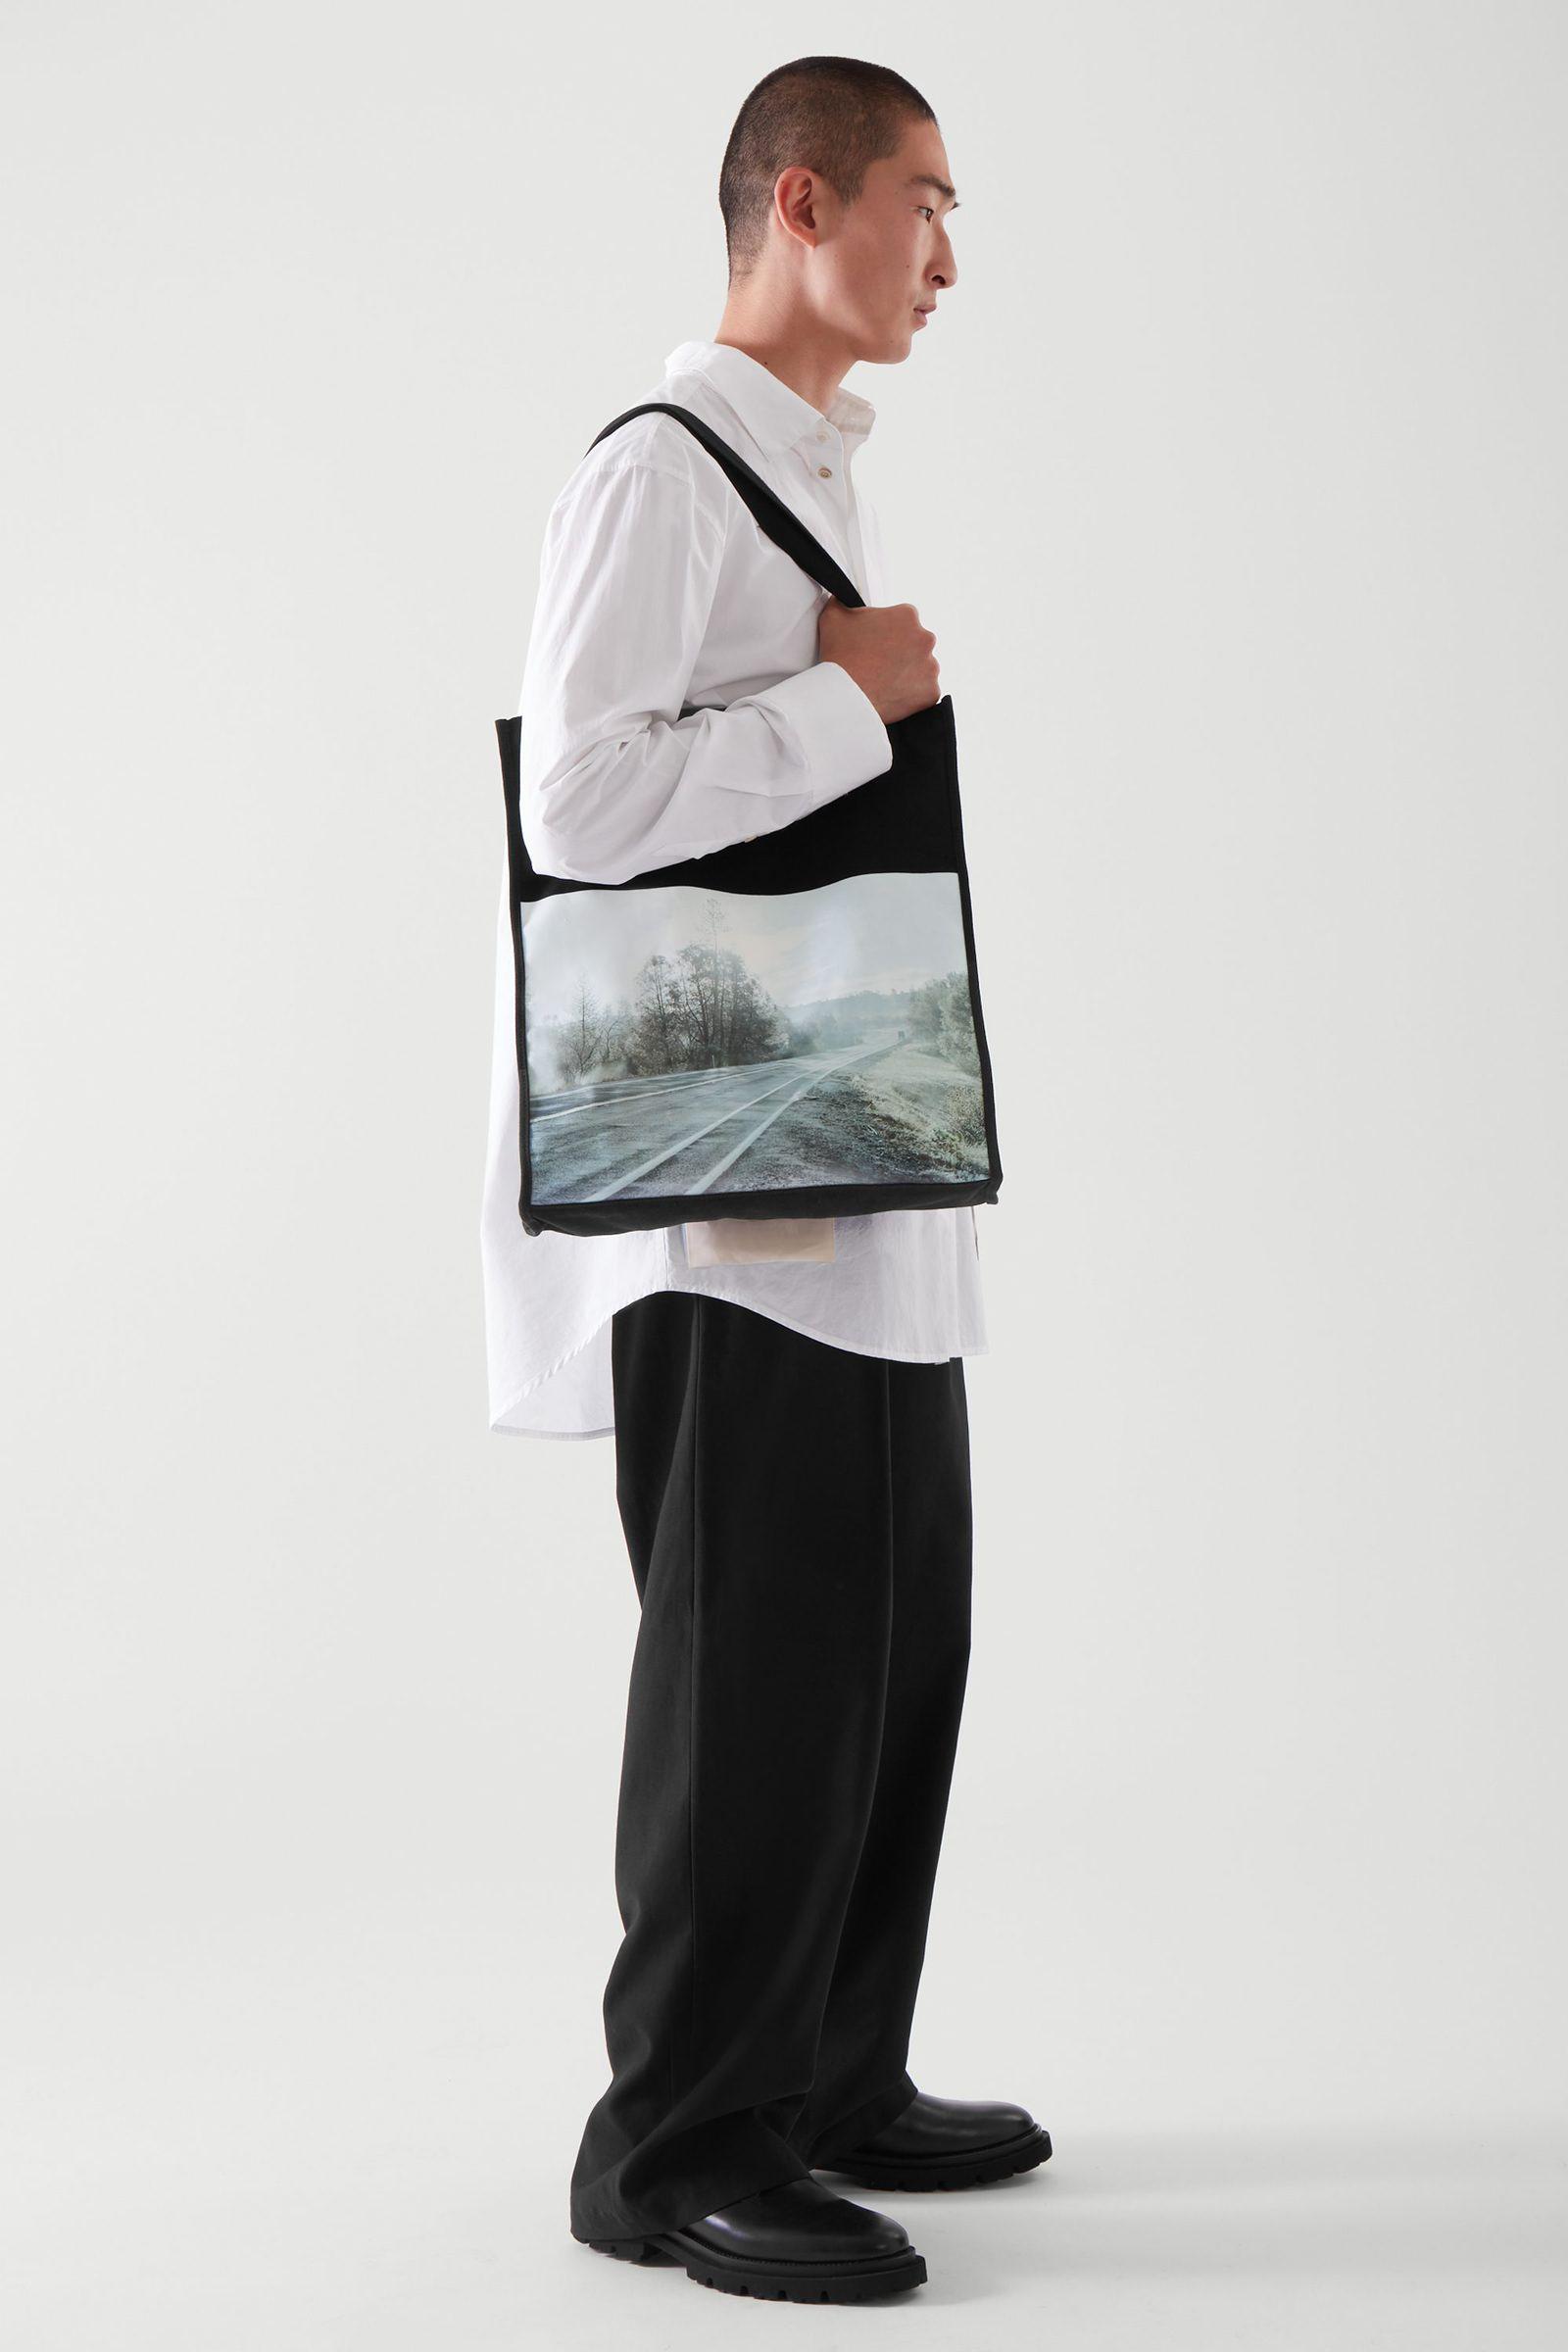 COS 포토 프린트 캔버스 토트백의 블랙 / 그레이컬러 ECOMLook입니다.